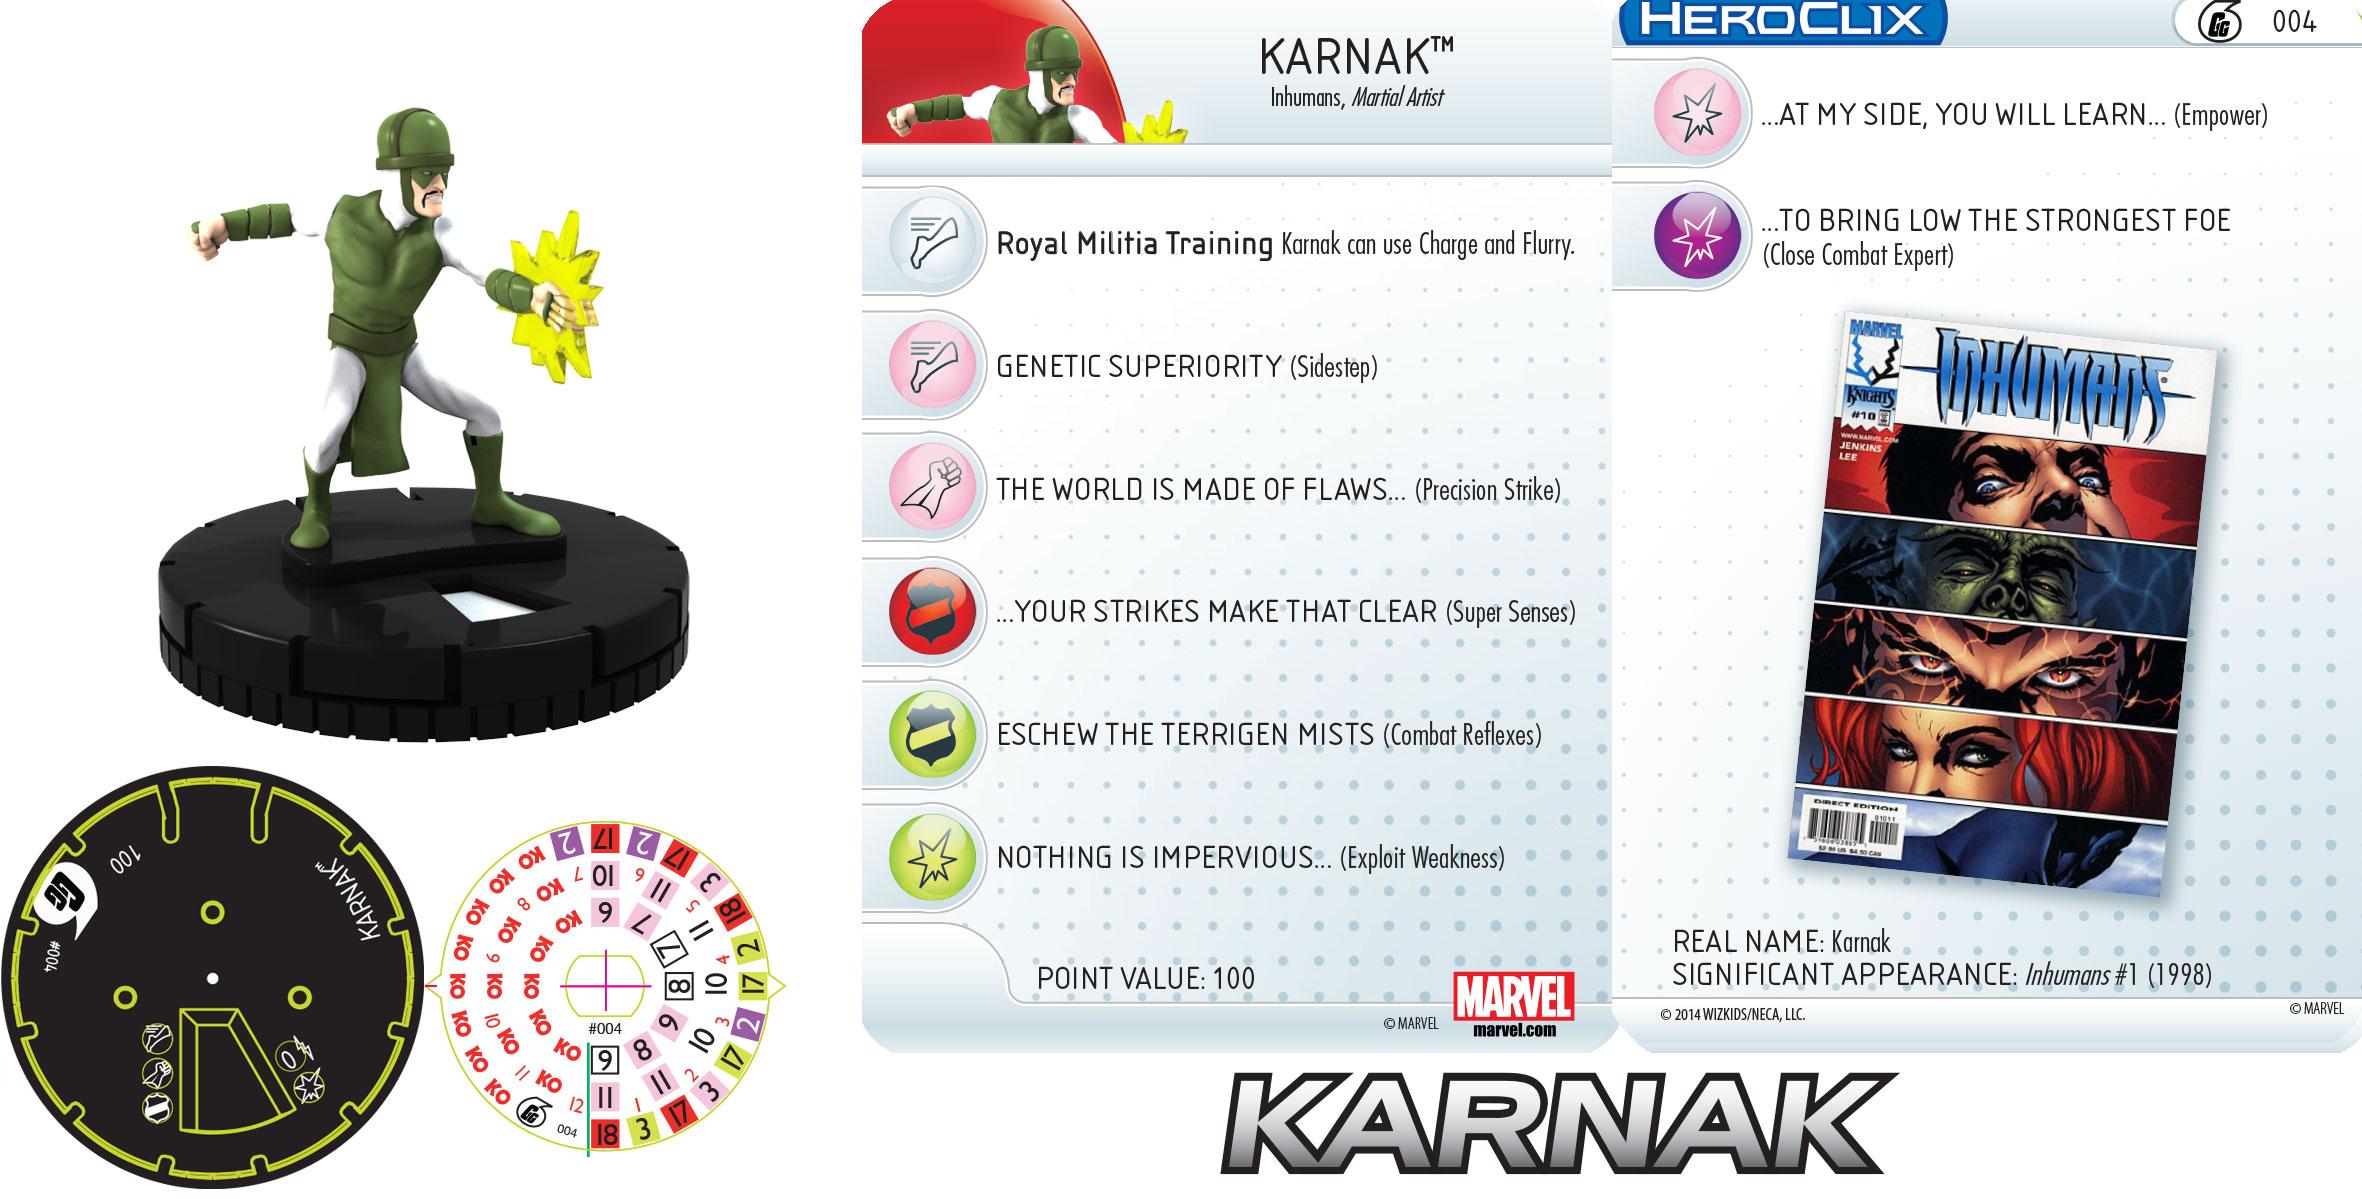 Marvel HeroClix: Karnak